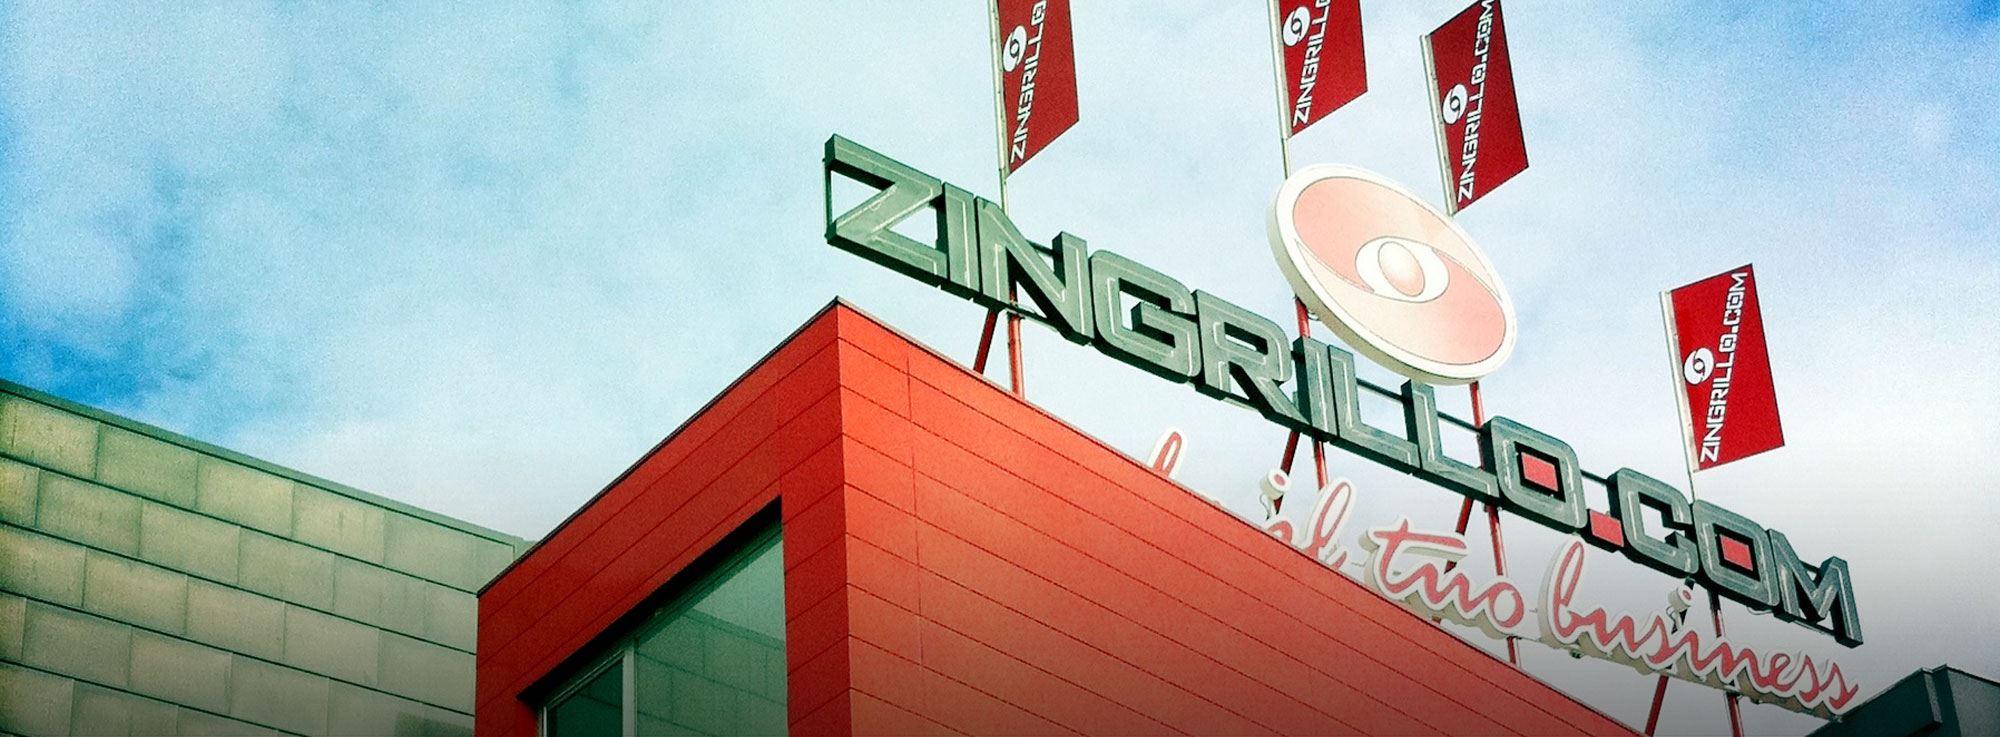 Zingrillo.com Barletta